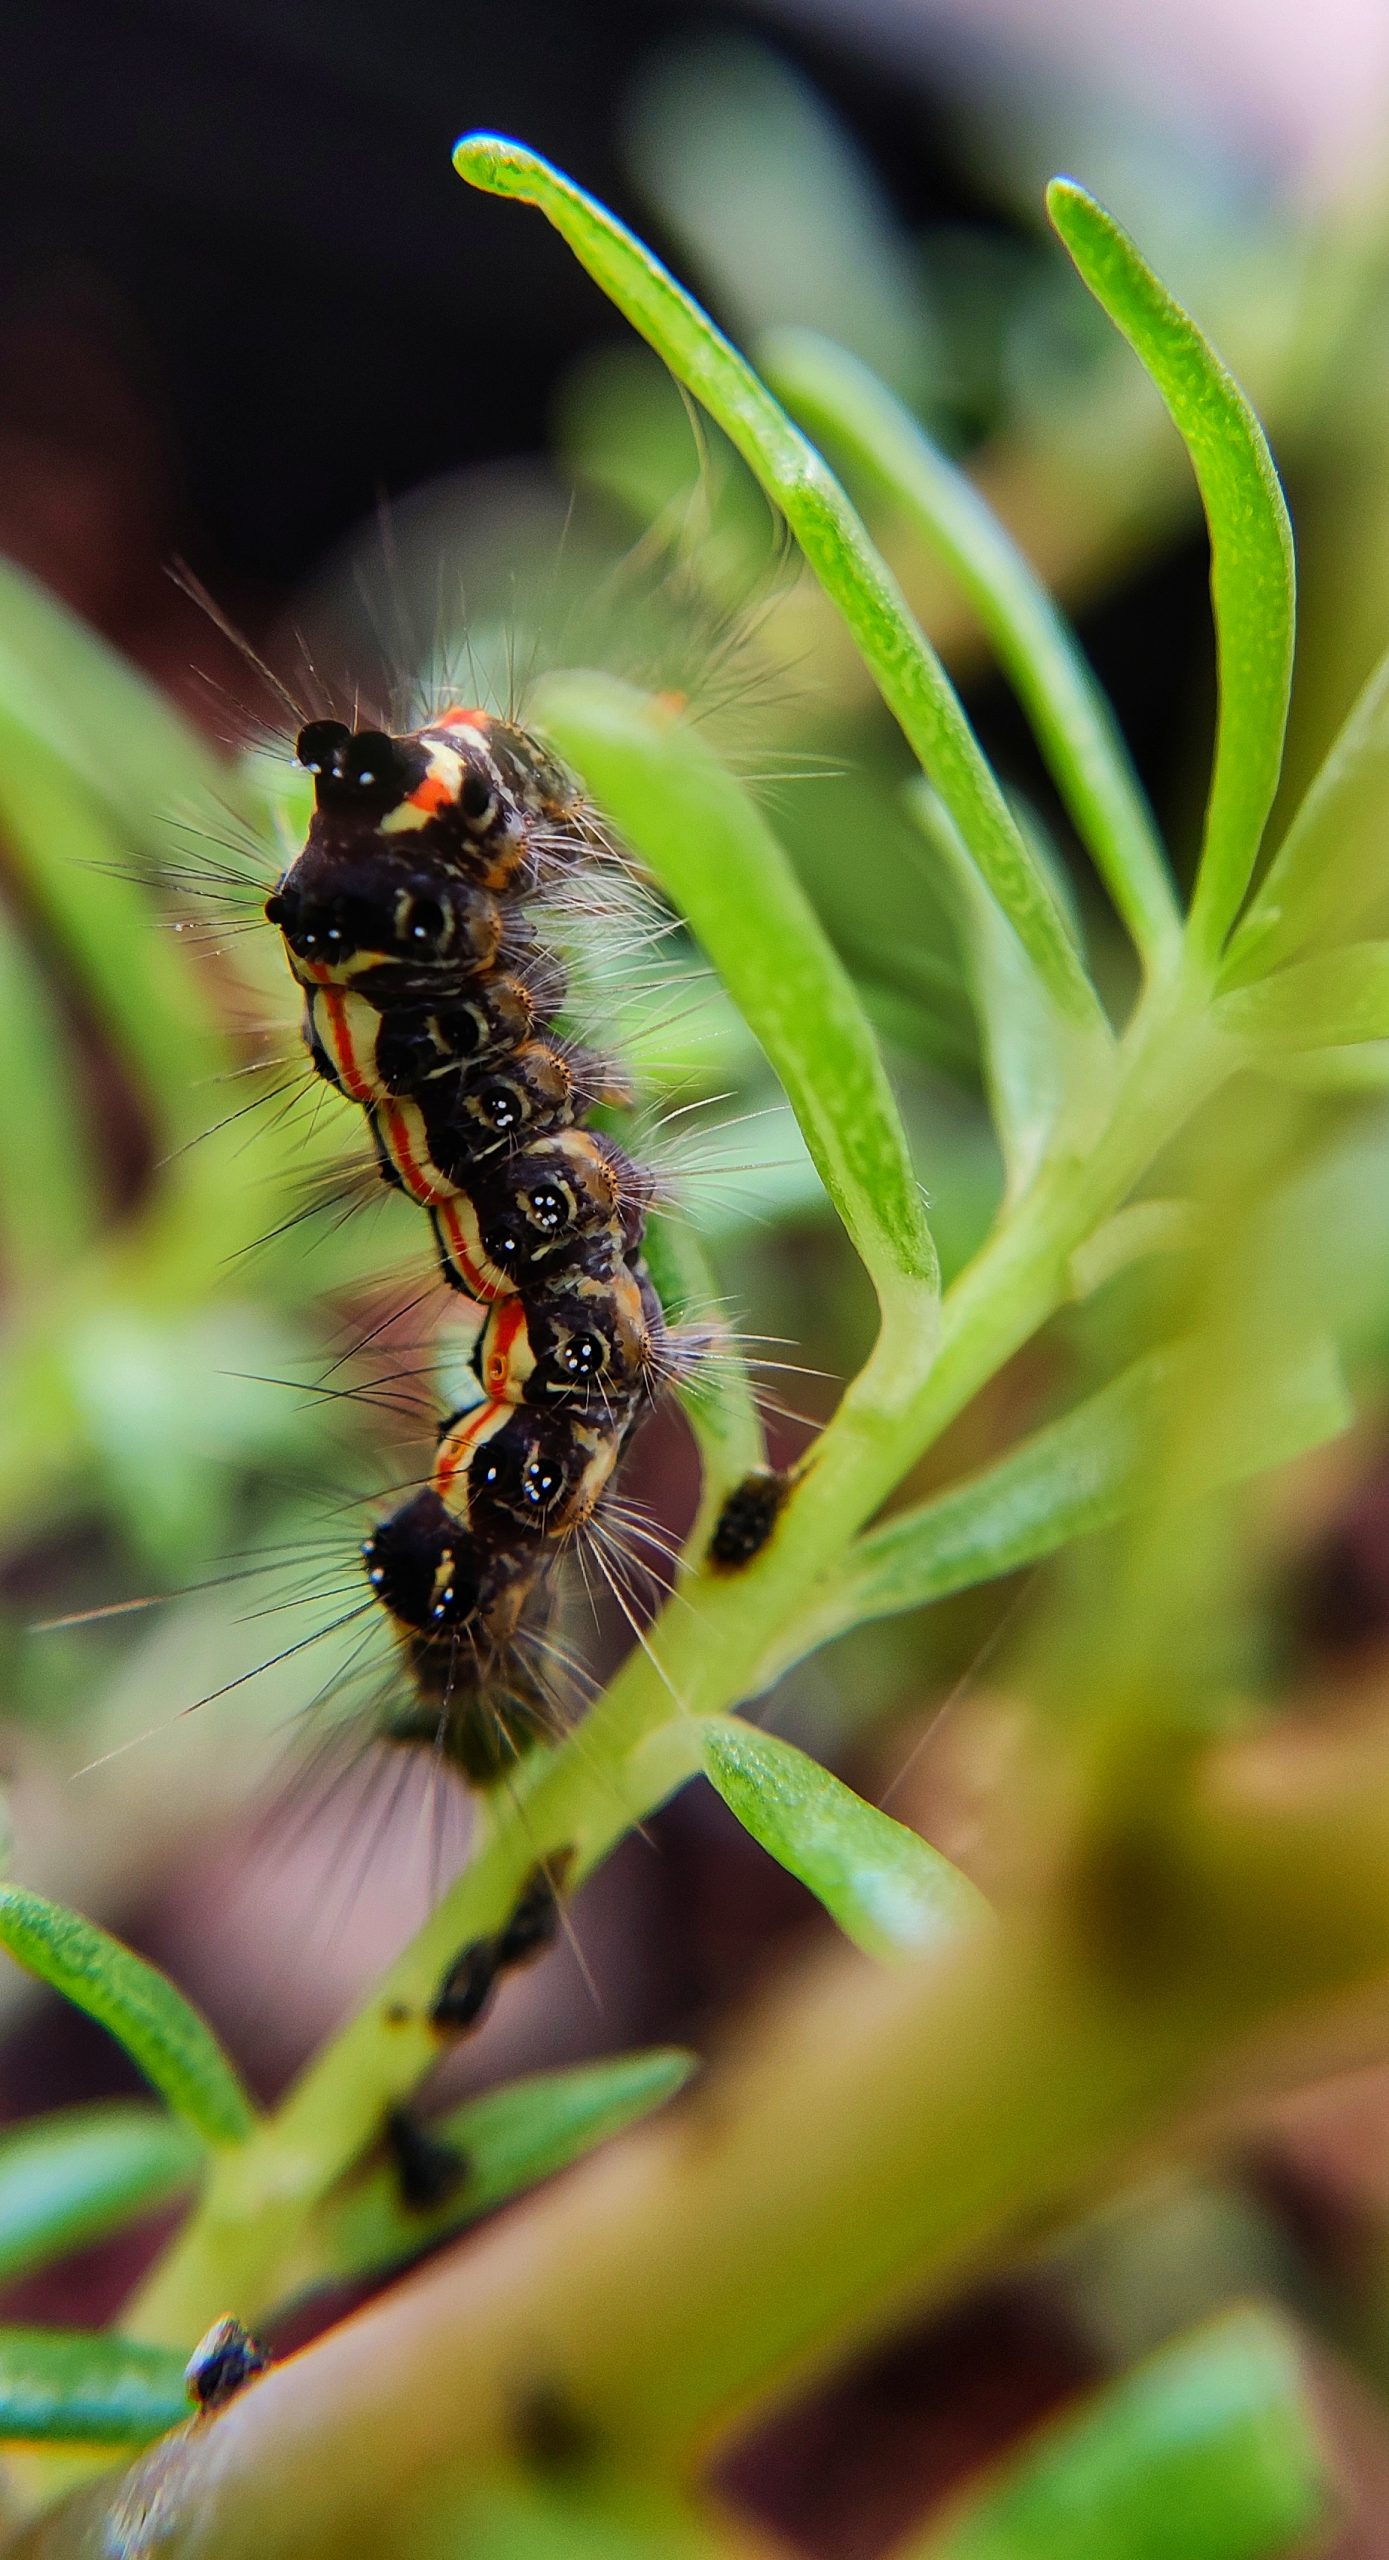 A caterpillar on a leaf